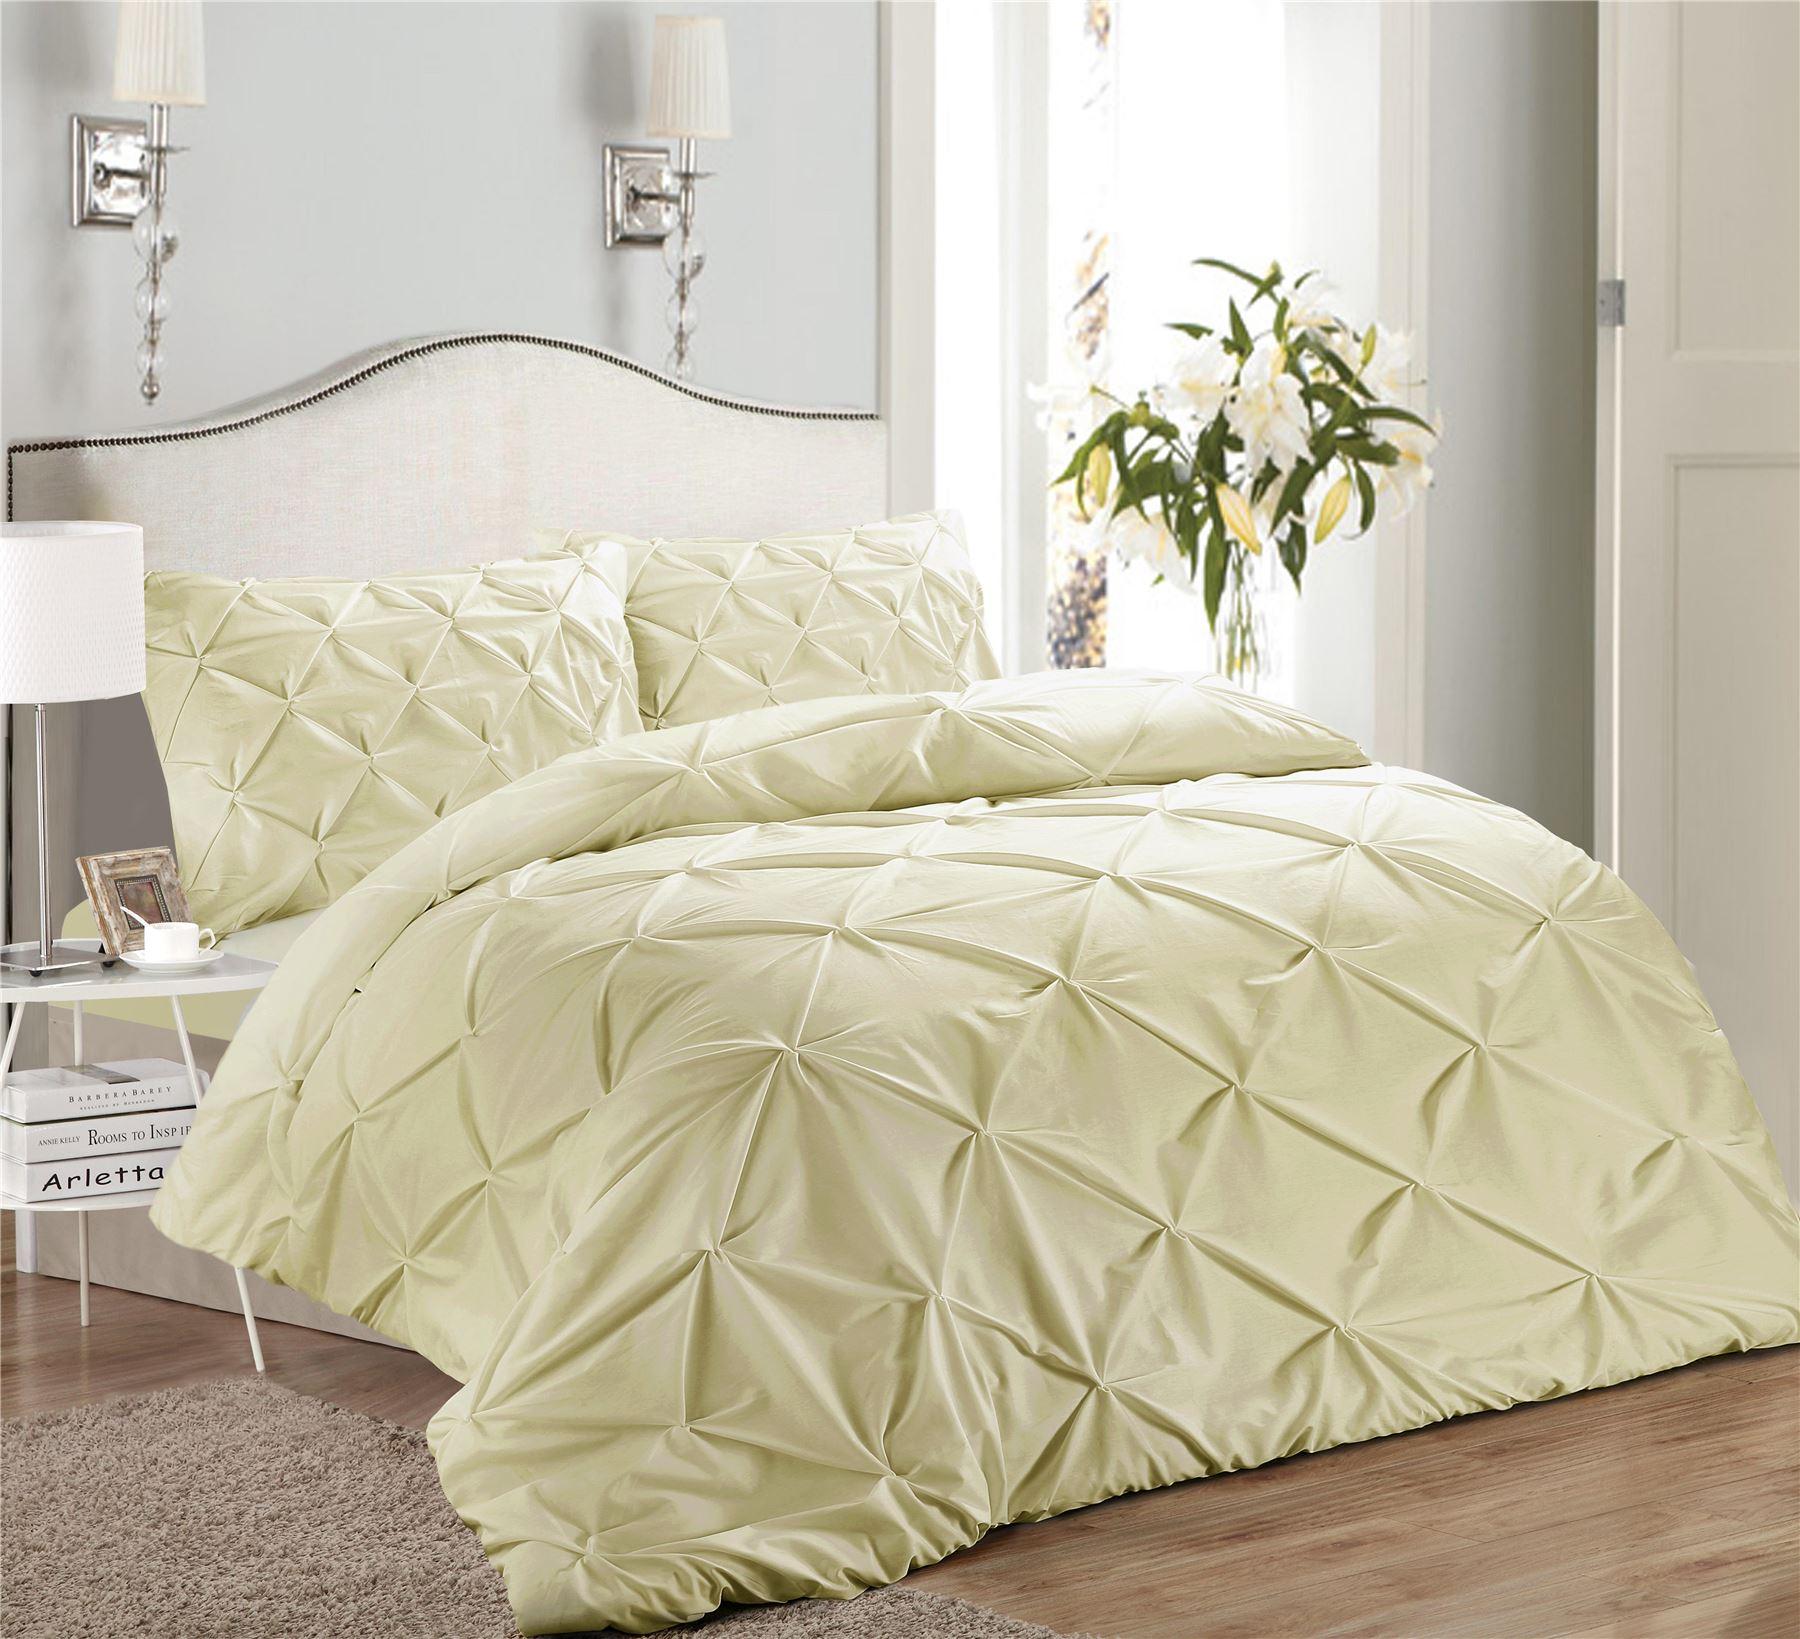 Luxury-Pure-100-Cotton-200-Thread-Pinch-Pleat-Pintuck-Puckering-Duvet-Cover-Set thumbnail 50